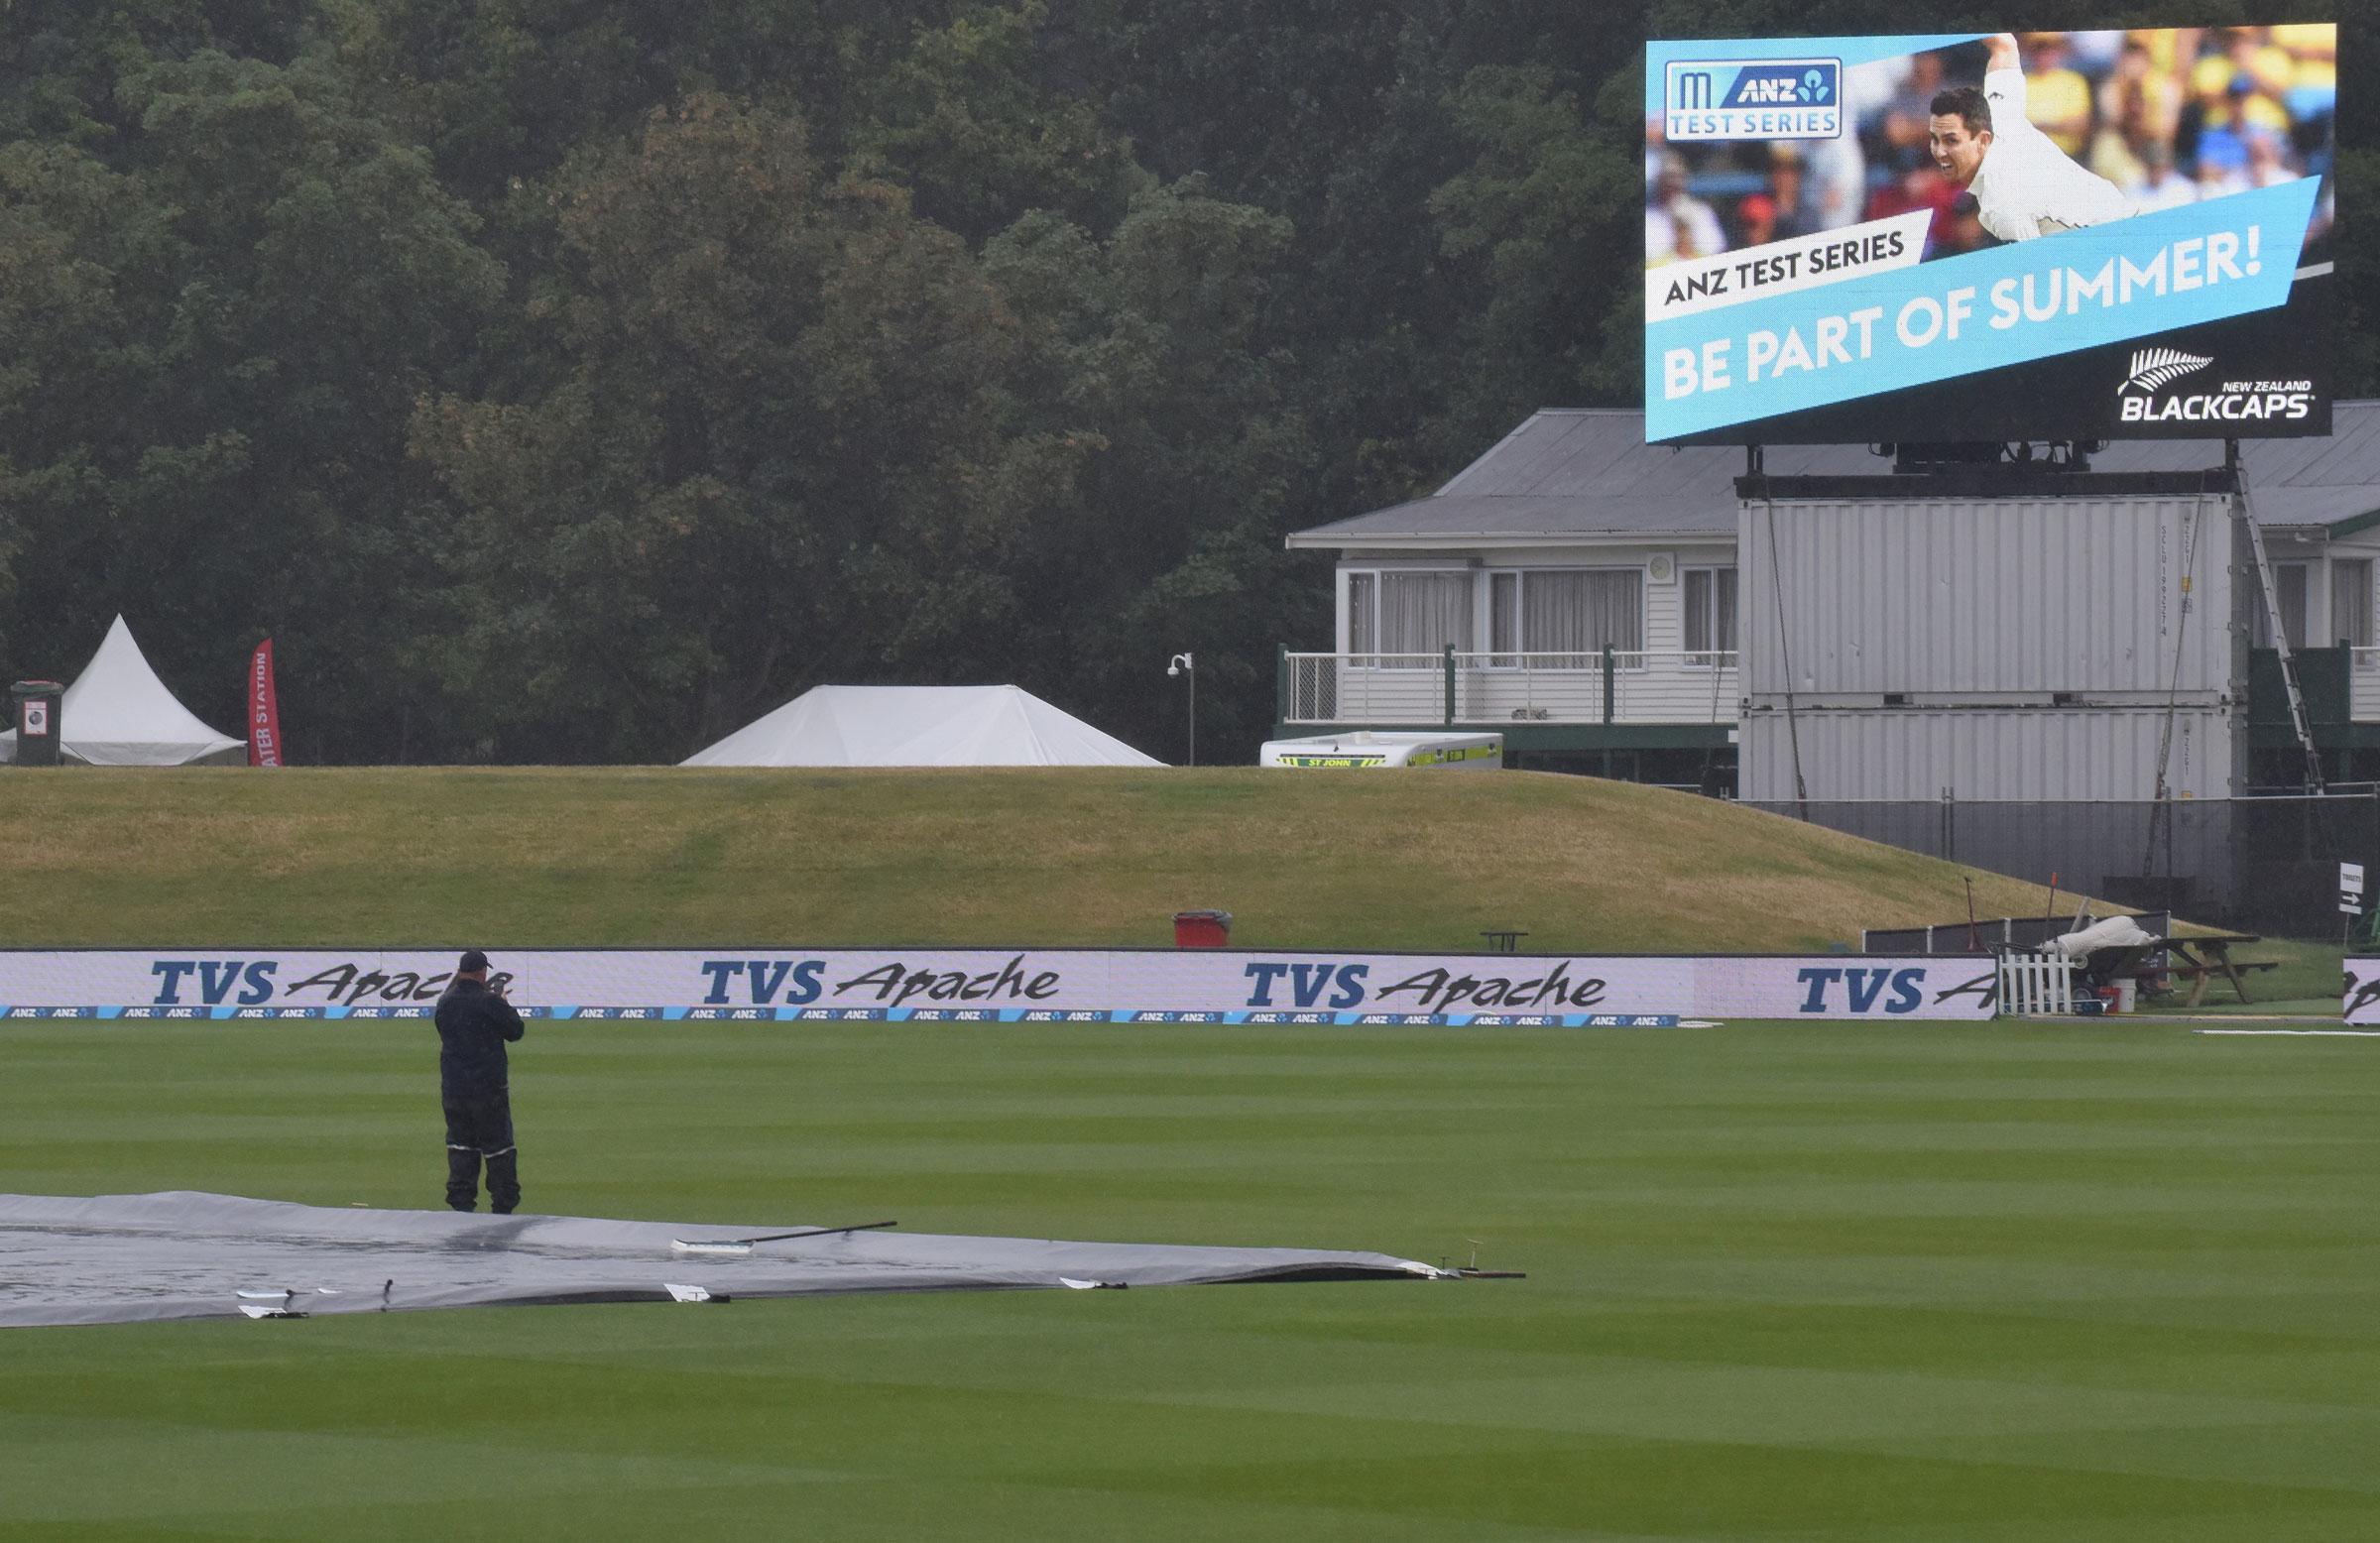 mcc laws of cricket 2017 pdf